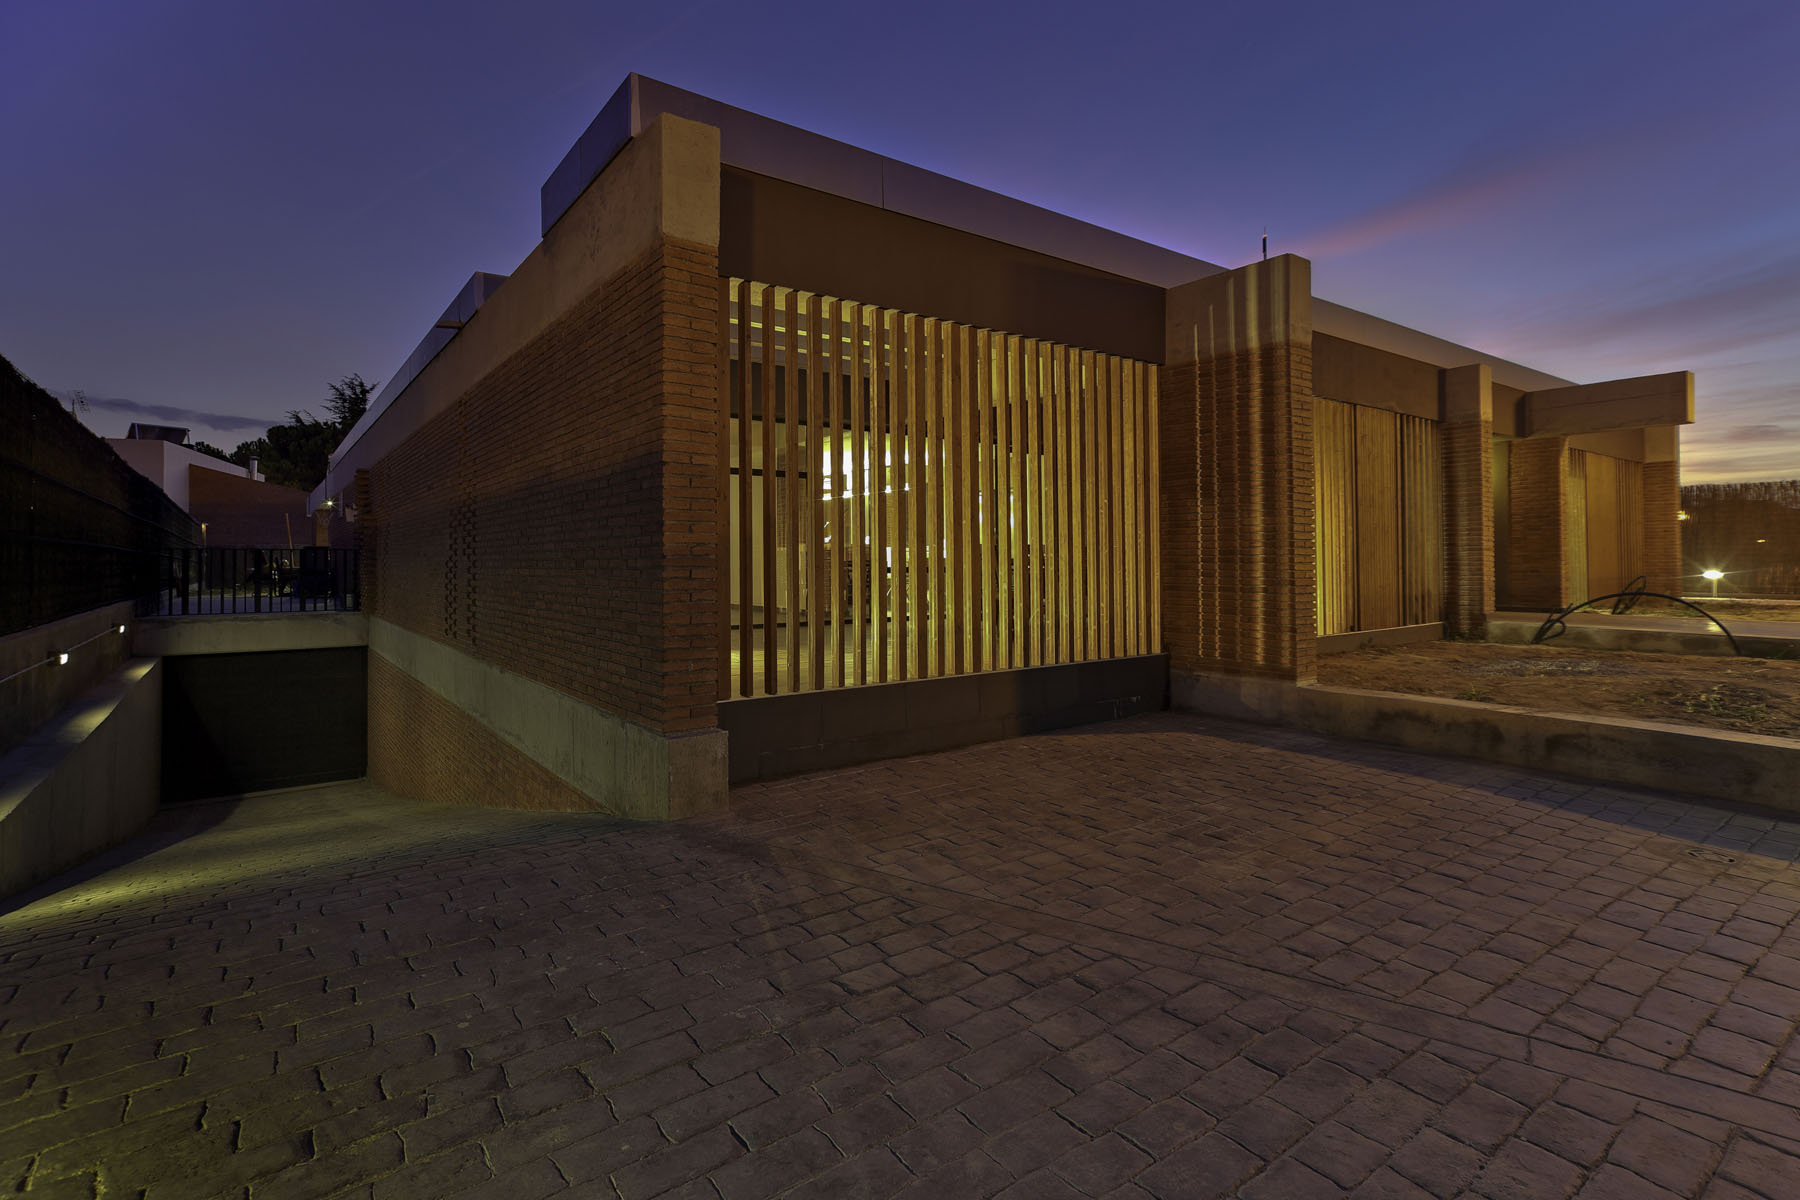 Casa em Alpicat / Albert Brito + Carles Enrich, Cortesia Brito e Enrich